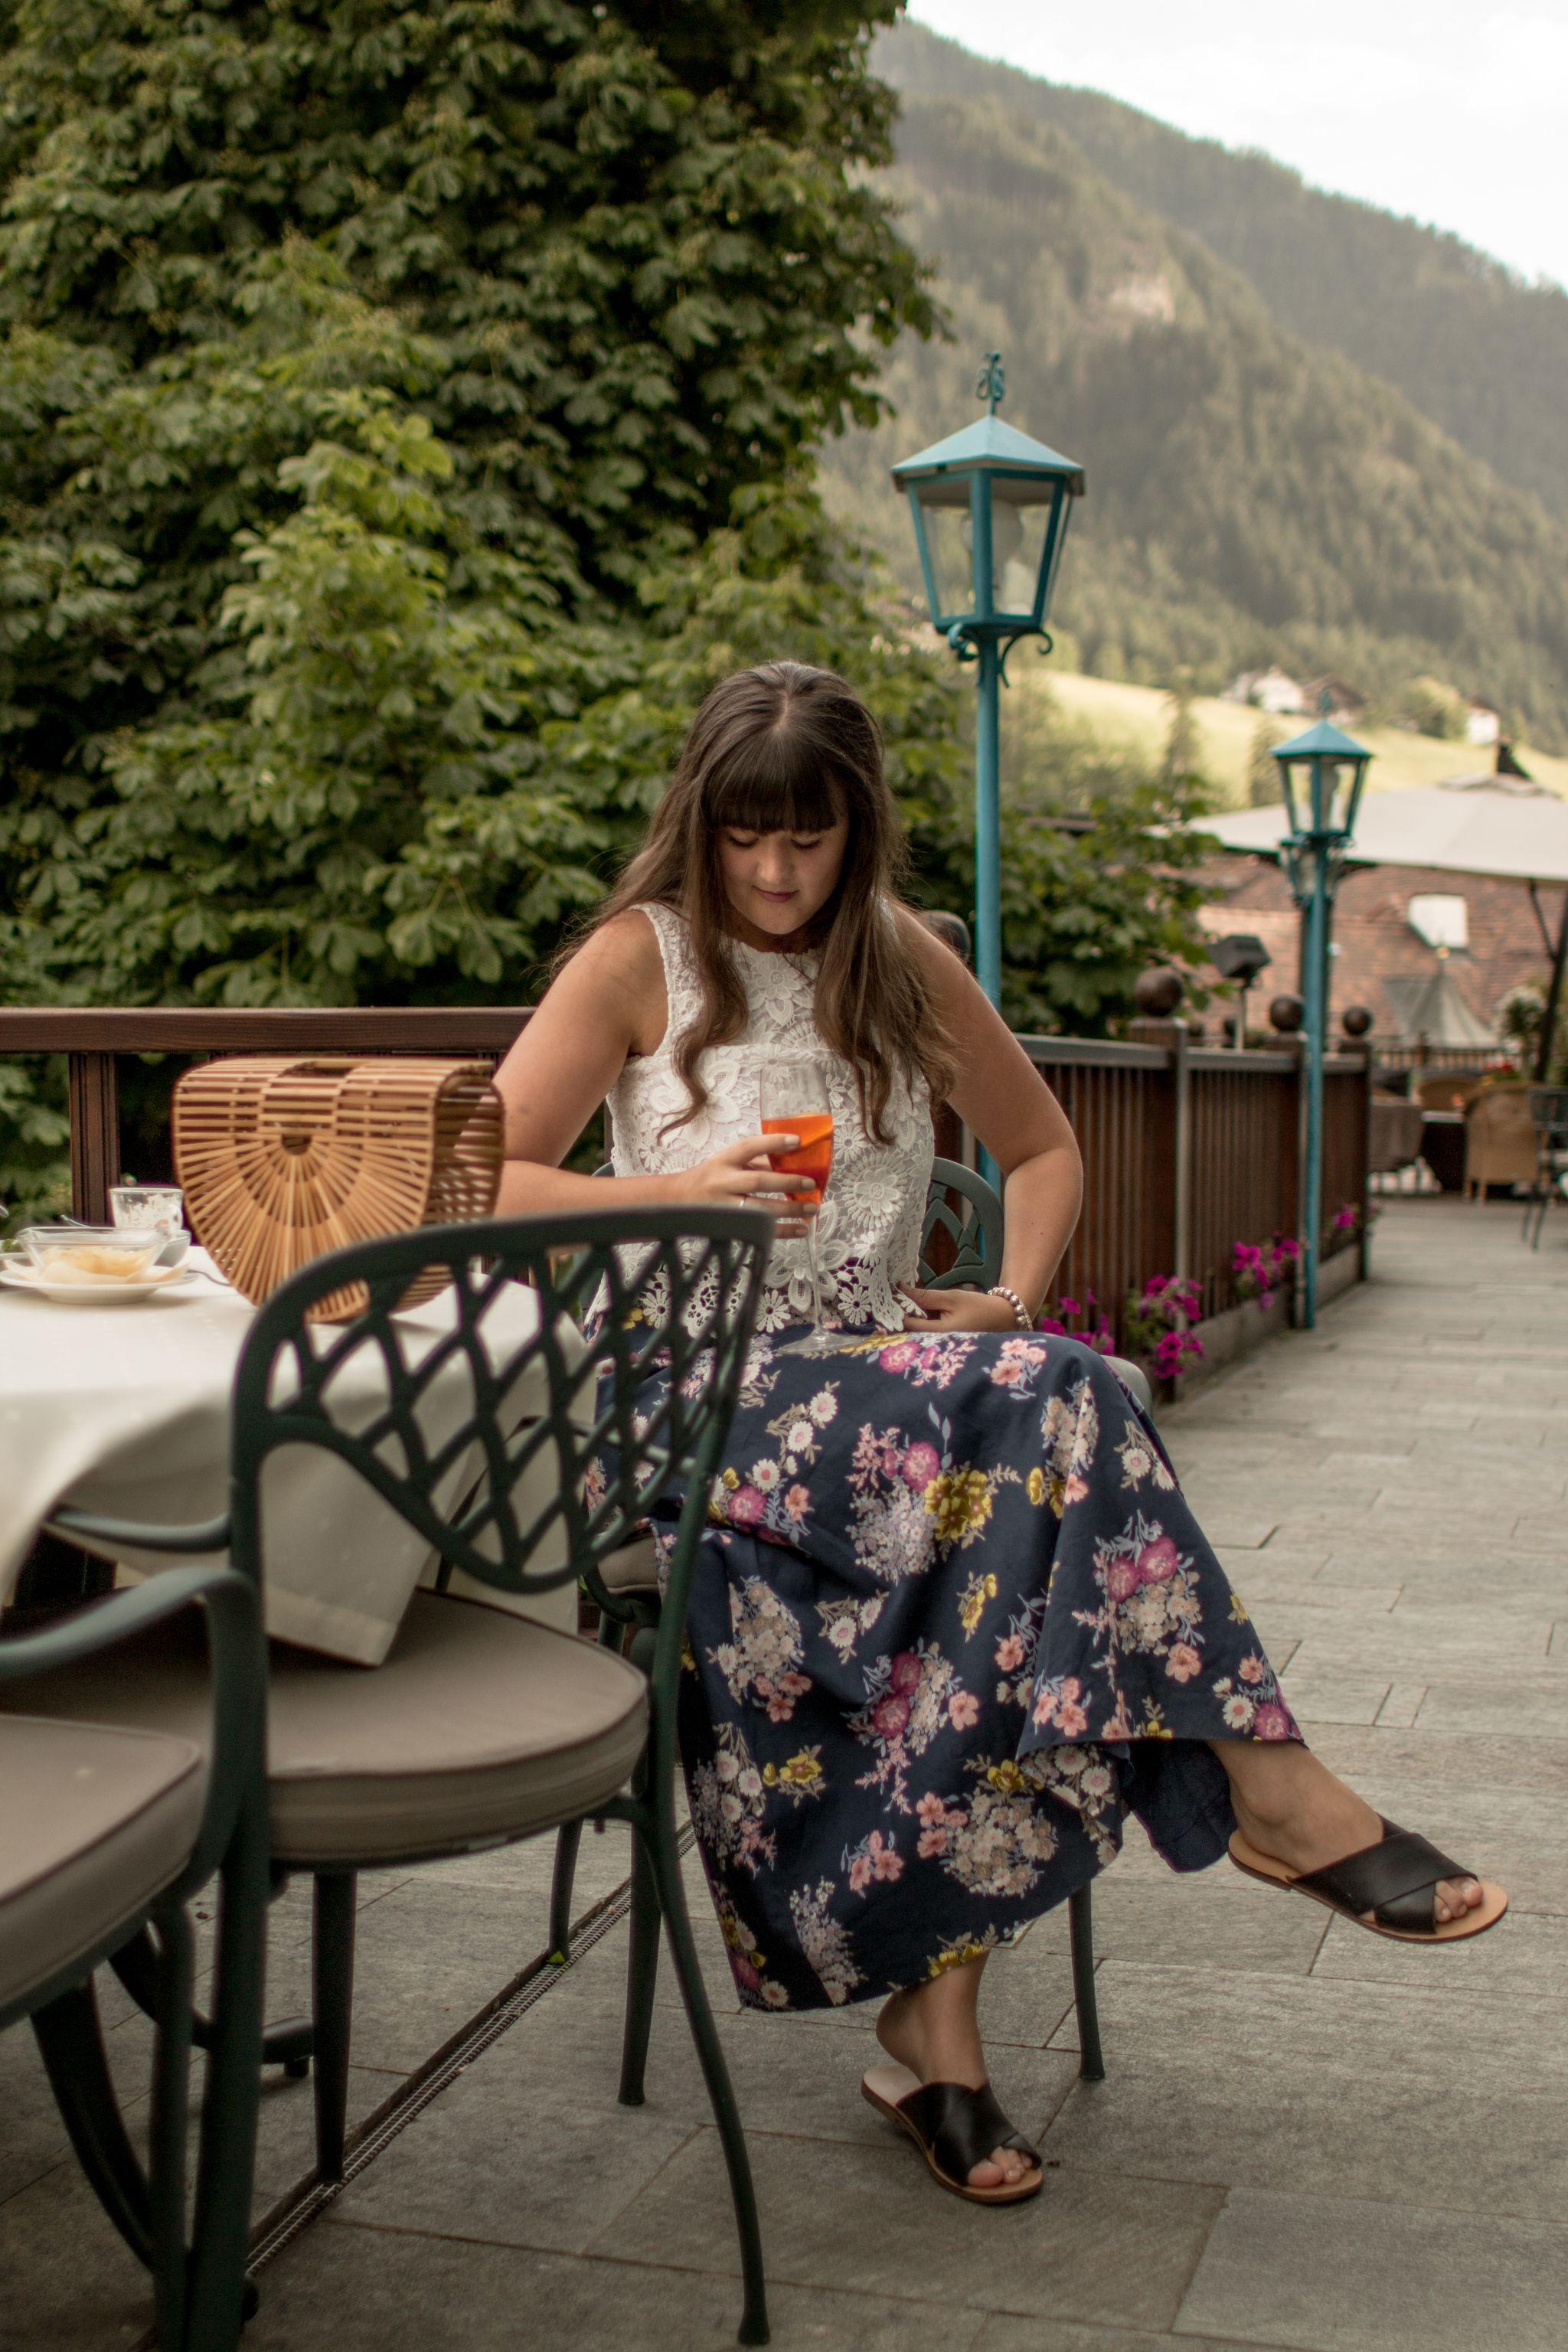 Adler Dolomites Hotel Ortisei Italy Hotel Review Evening Aperitif Gardens